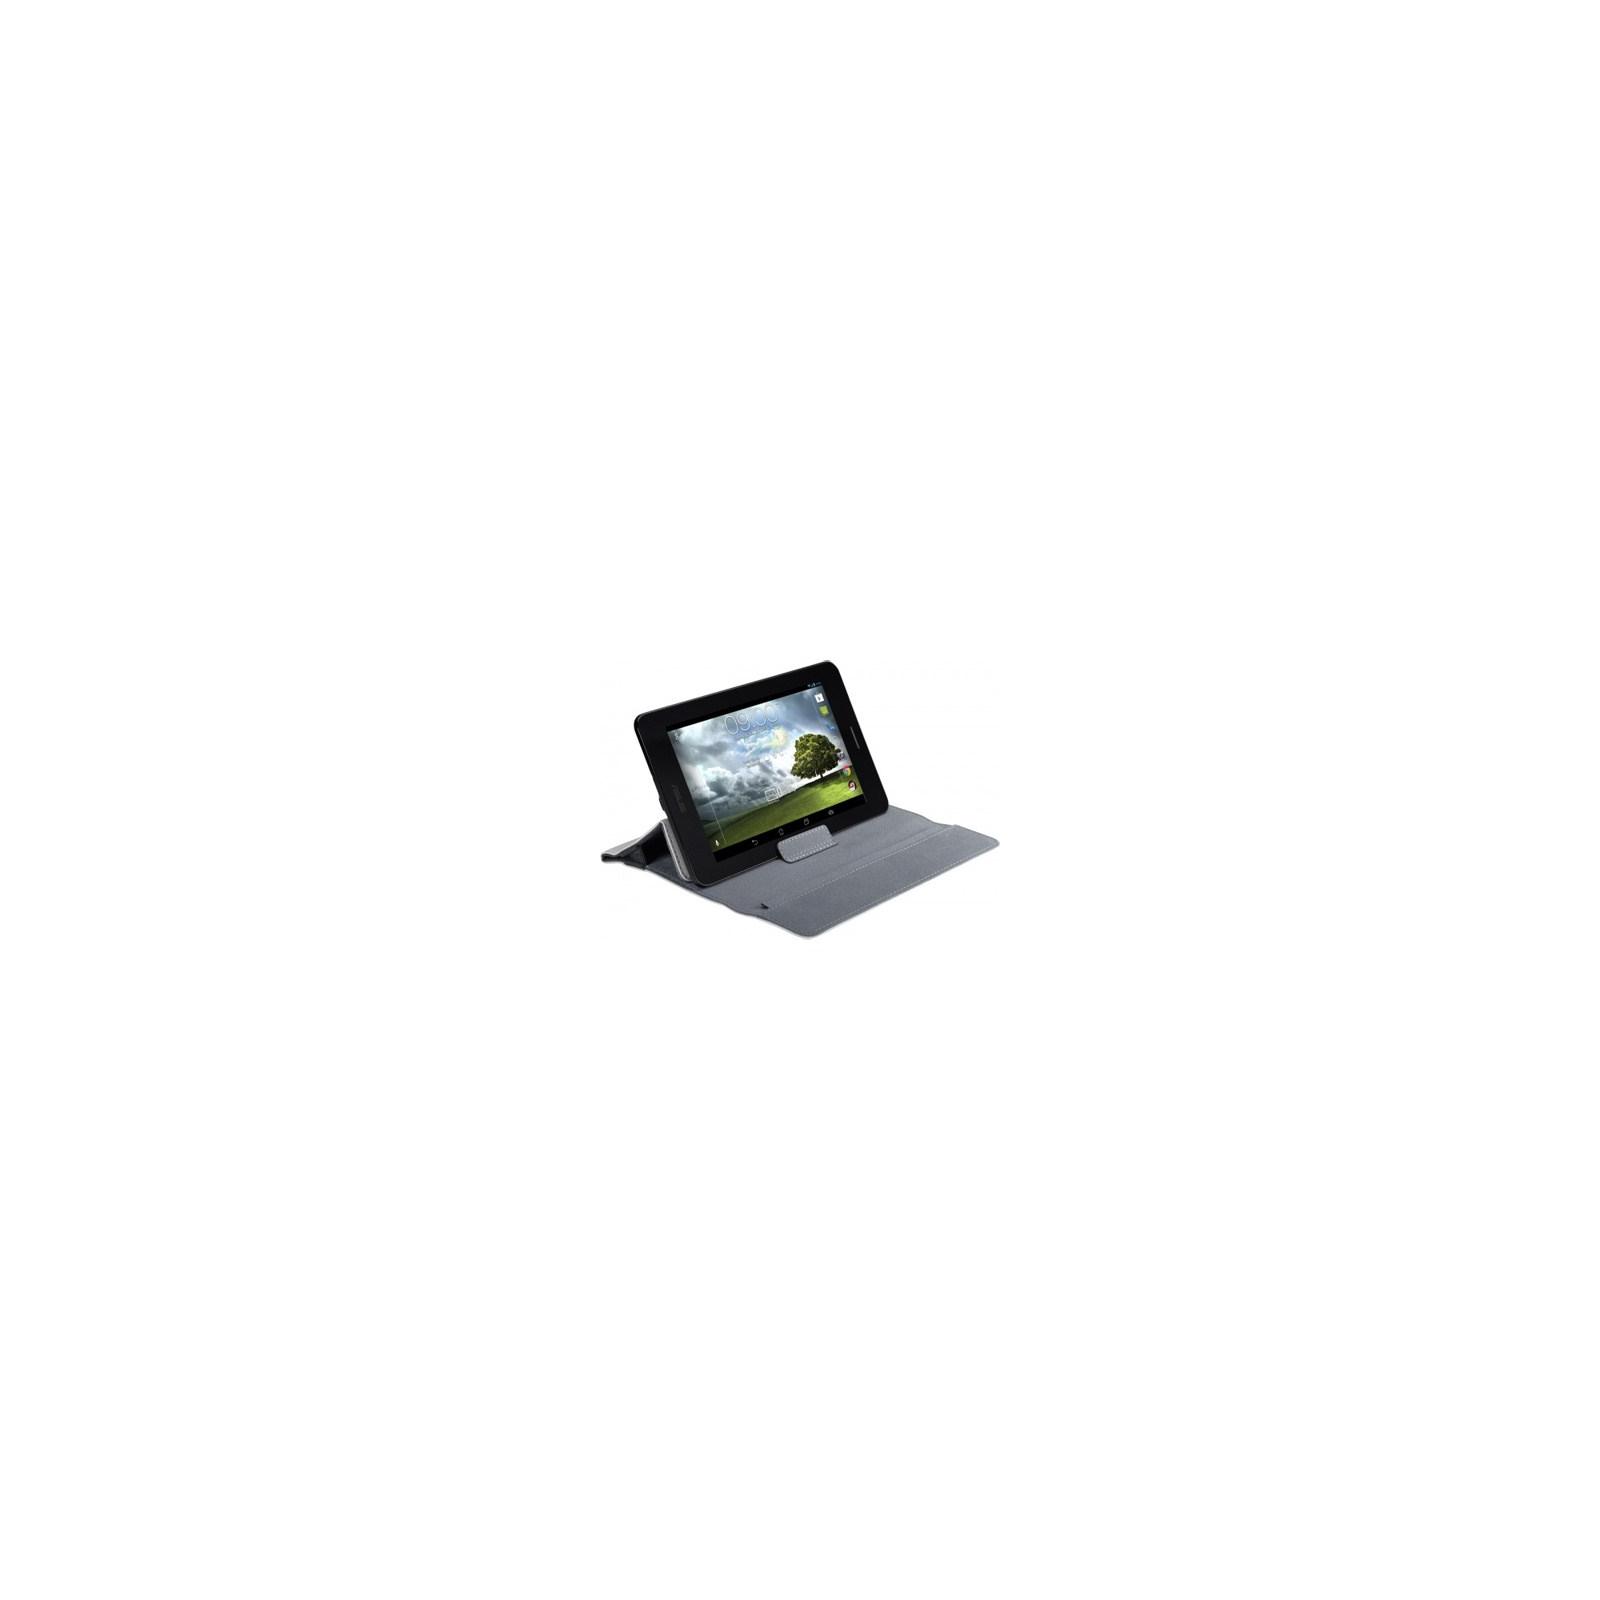 Чехол для планшета ASUS ME172/ME173/ME371/Nexus 7 VERSASLEEVE7 BLUE (90XB001P-BSL030) изображение 2